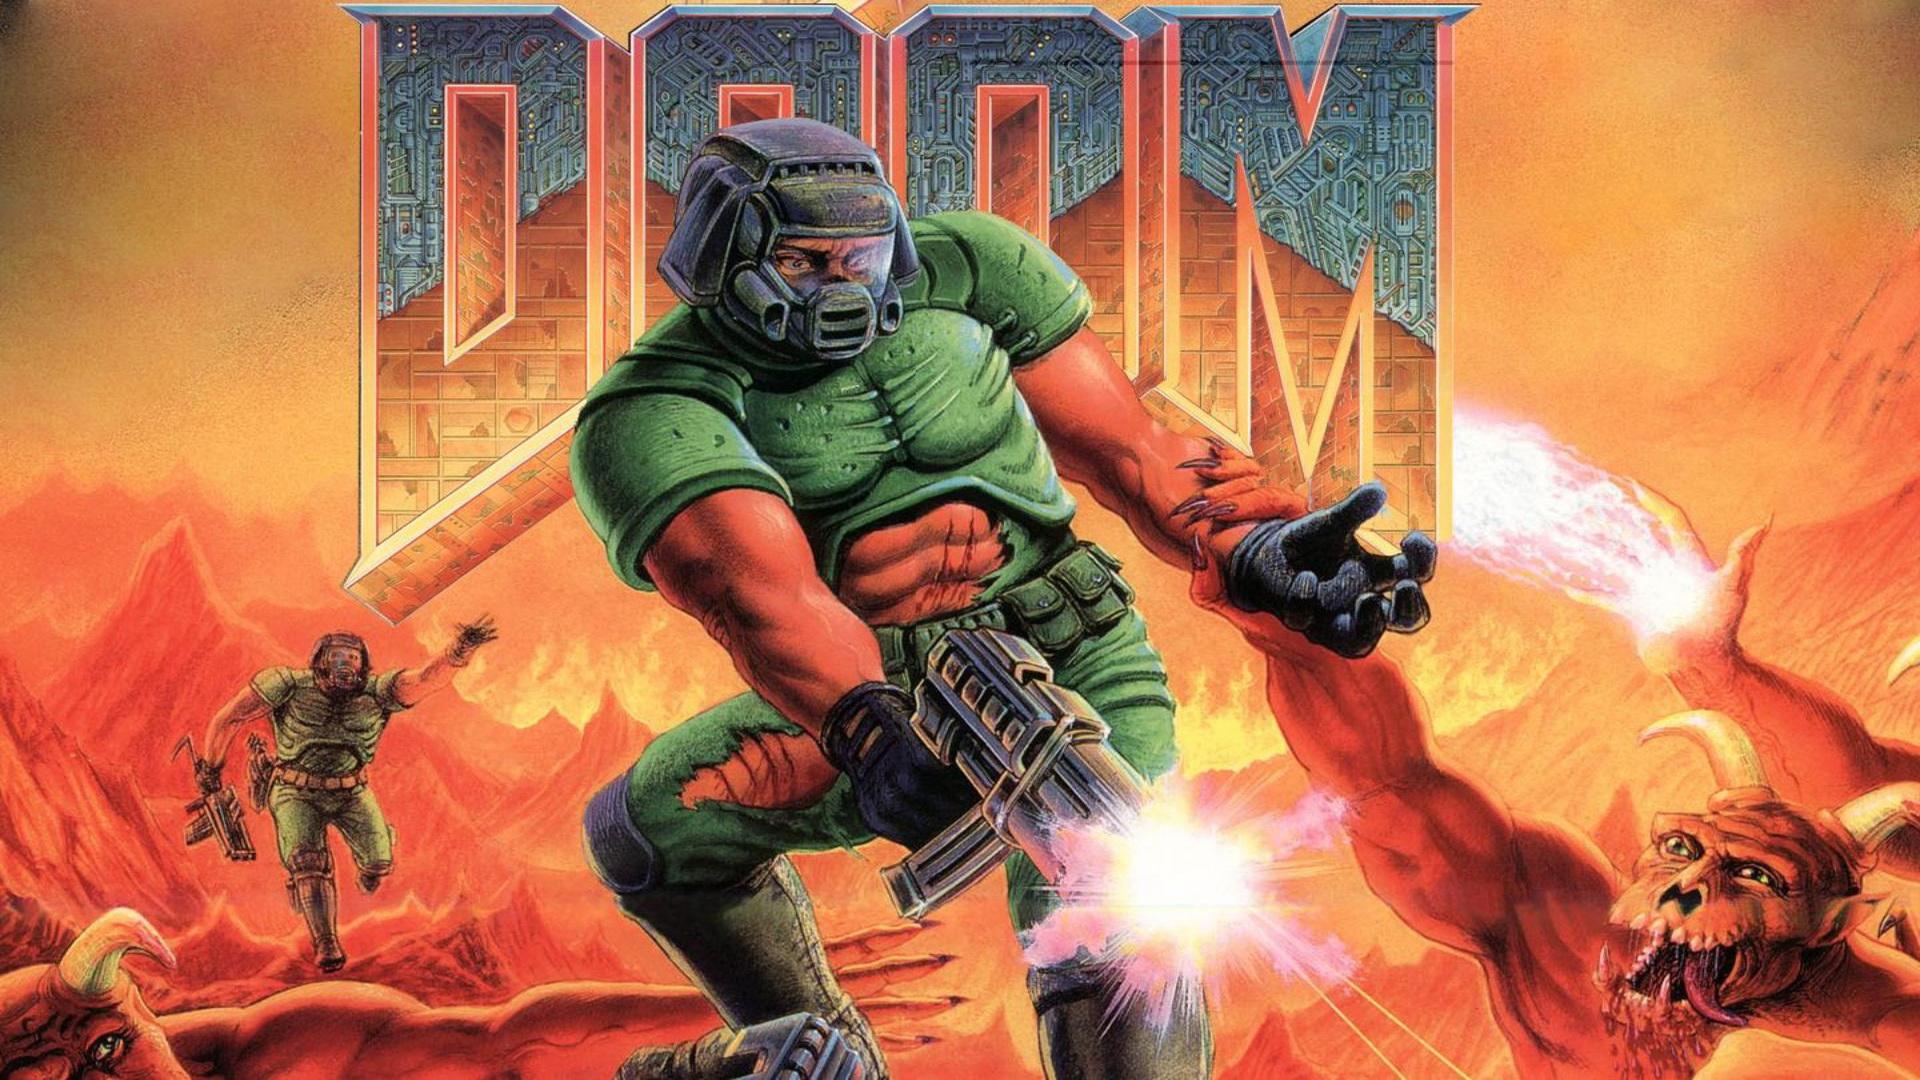 doom hd Wallpaper Game HD Wallpapers Video Games HD 1080p Wallpaper 1920x1080